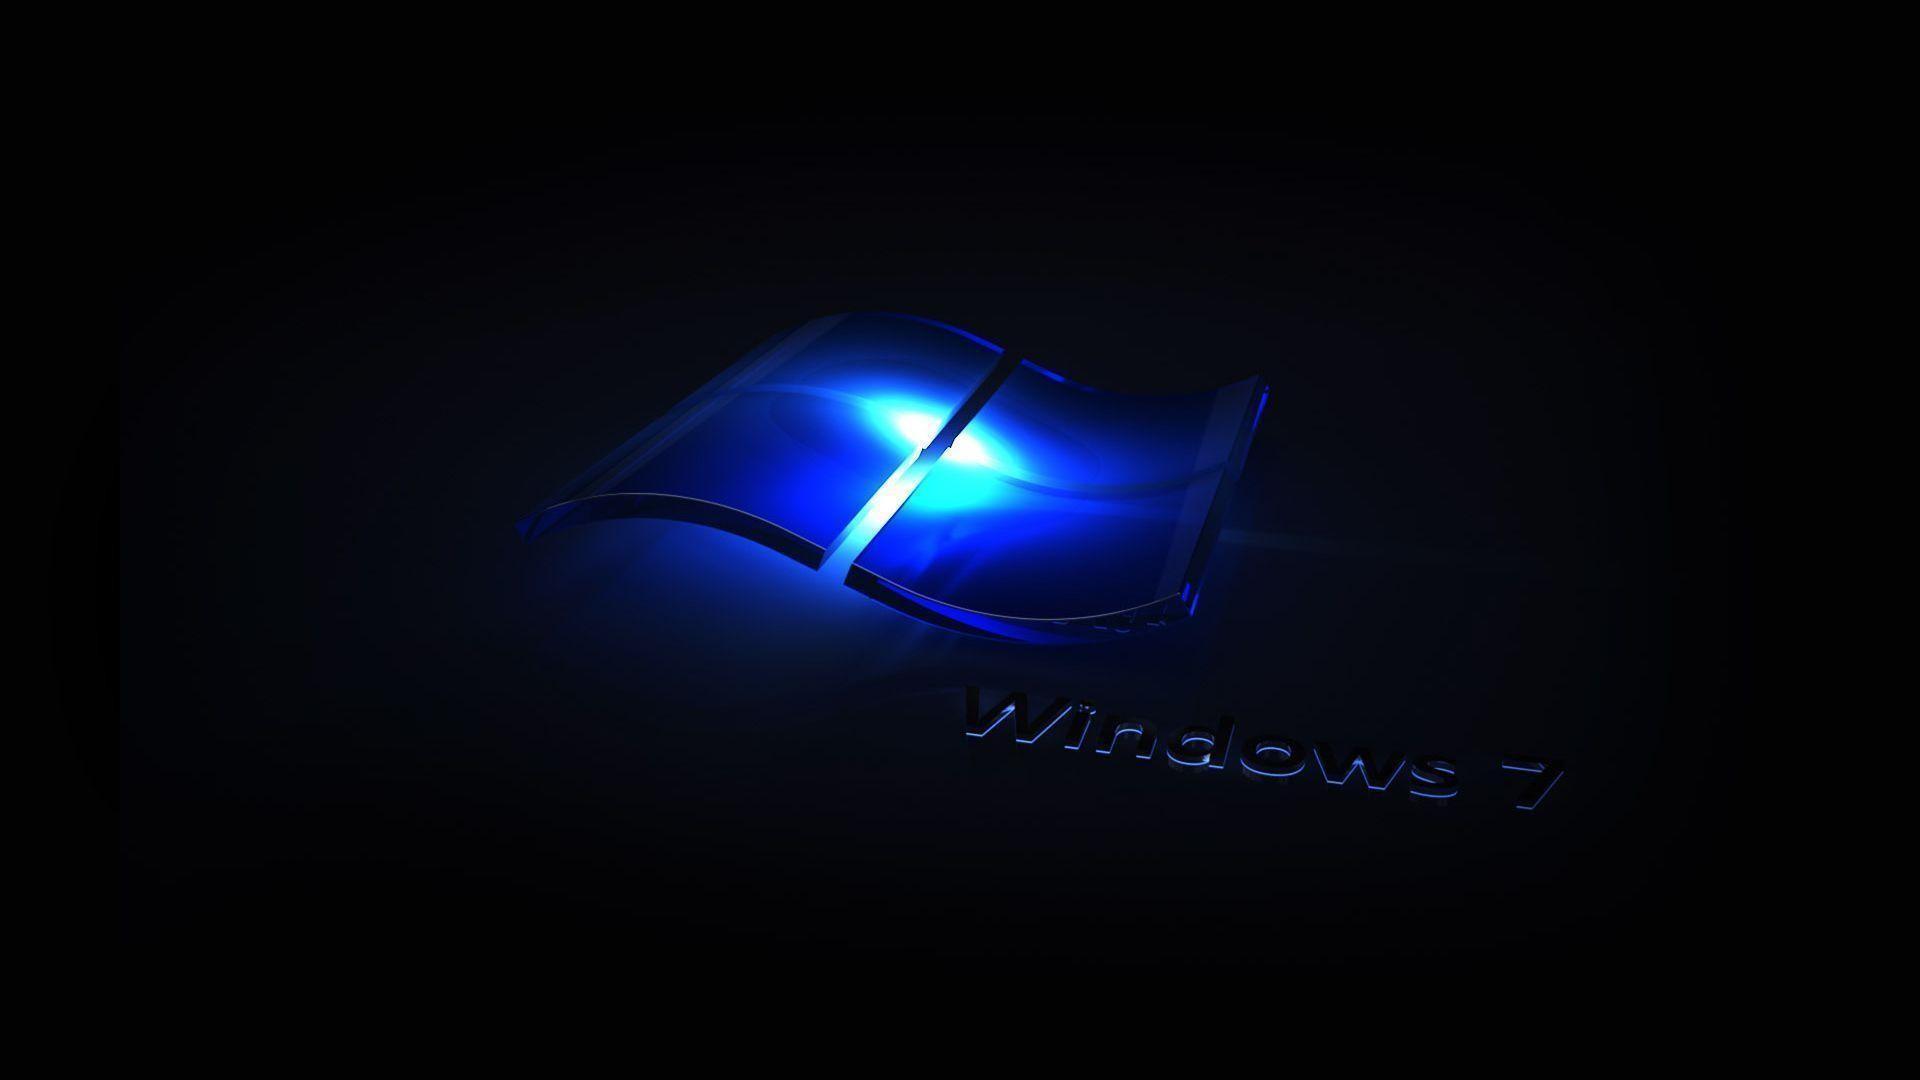 Desktop Wallpaper · Gallery · Windows 7 · Blue Light Windows 7 .